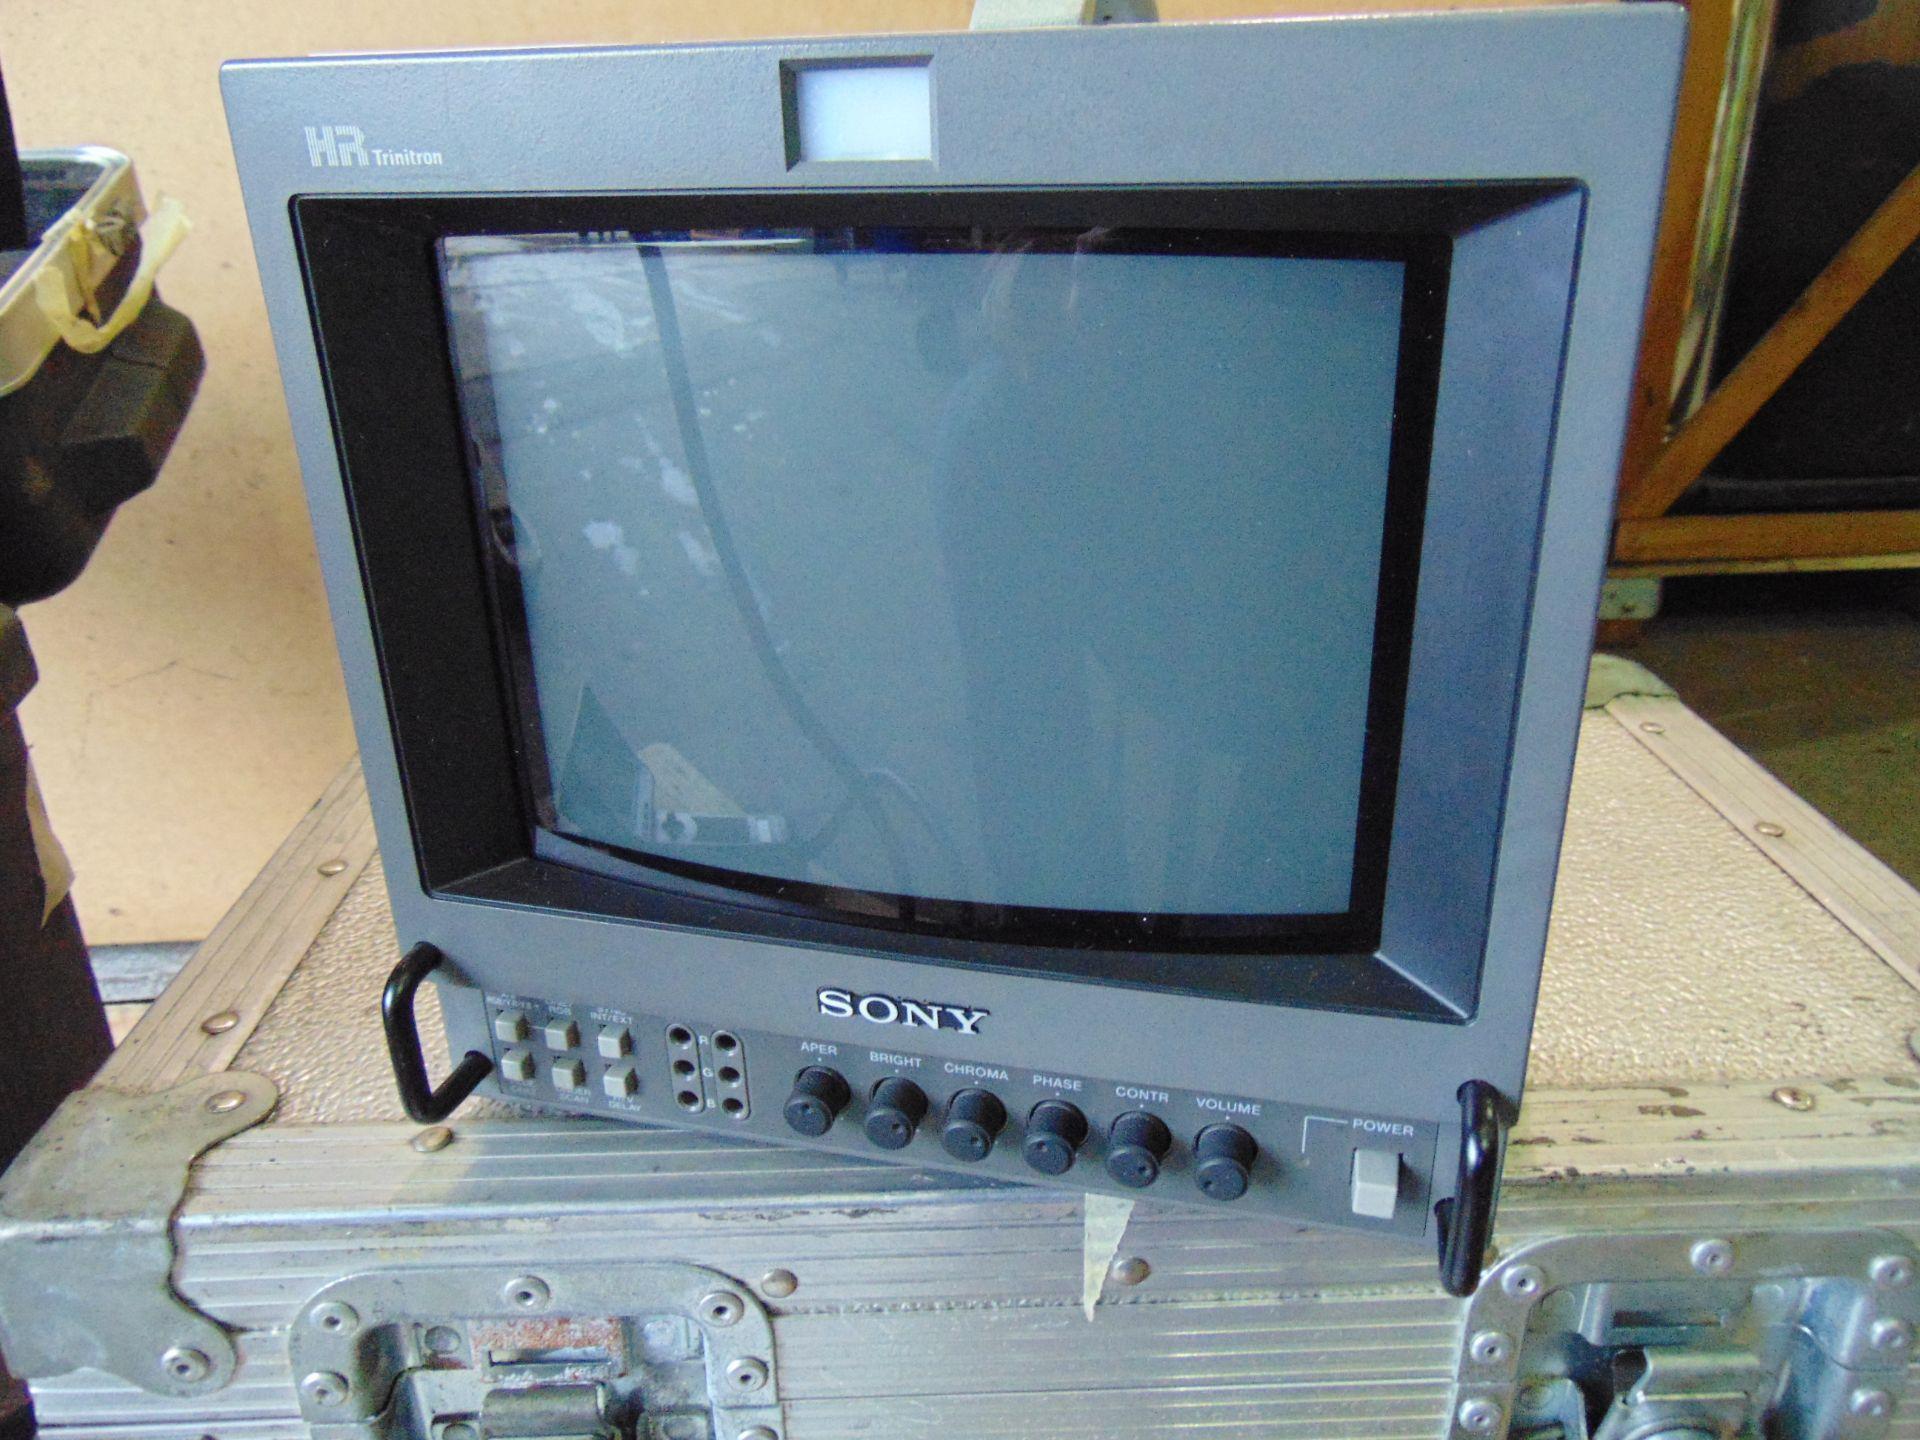 Lot 26825 - GE Everest Video Probe Borescope/Endoscope Kit XL240LSB with Sony PVM9044QM Colour Monitor